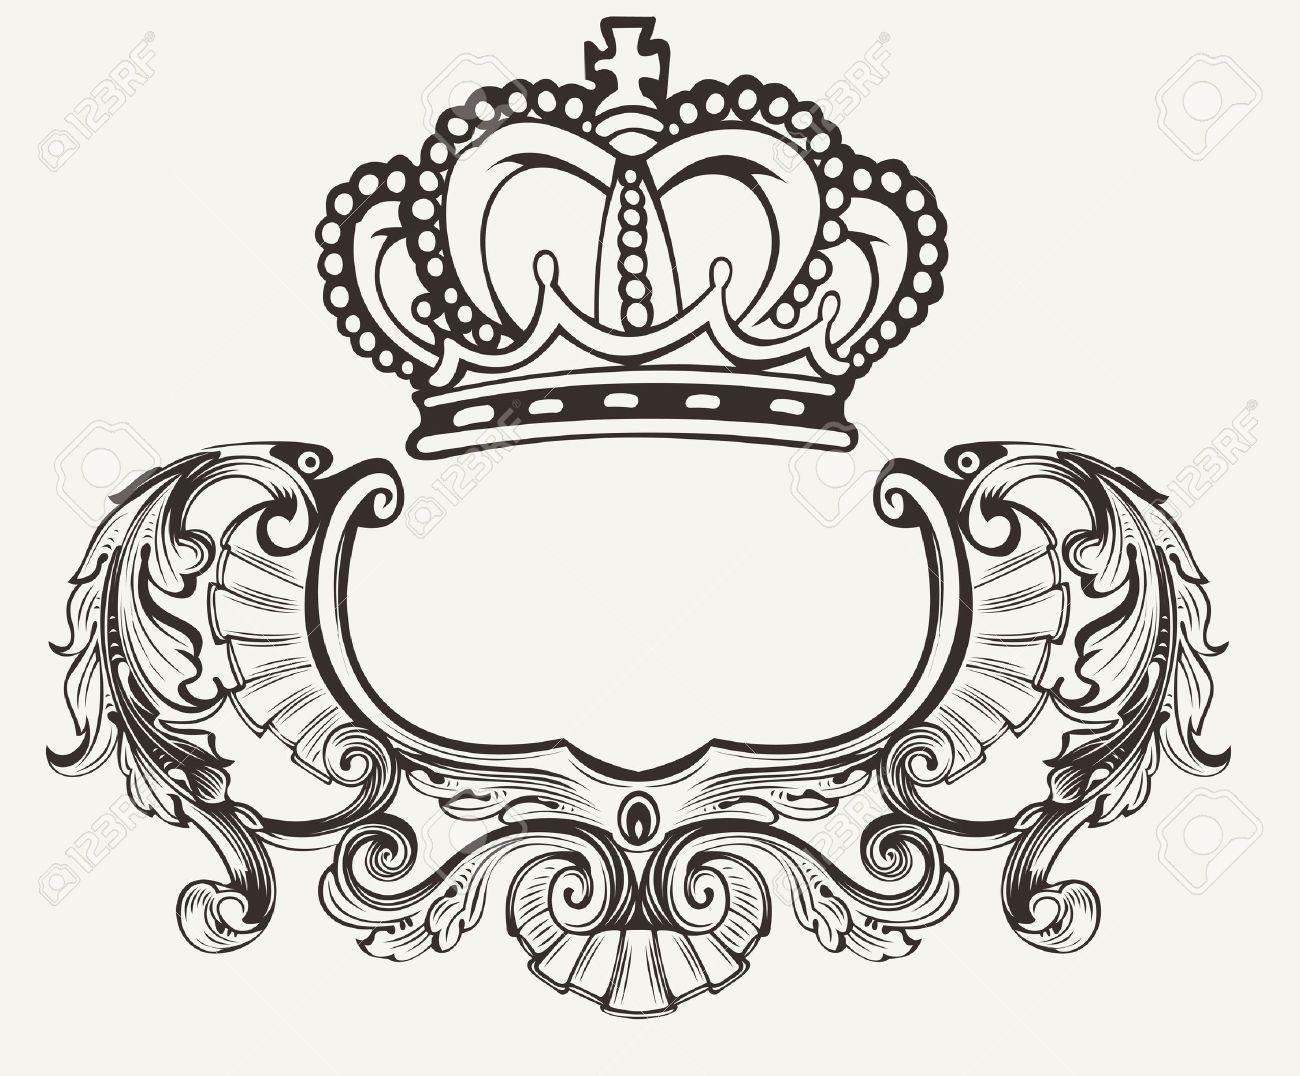 Royal crest clipart banner free download Royal crest clipart 5 » Clipart Portal banner free download